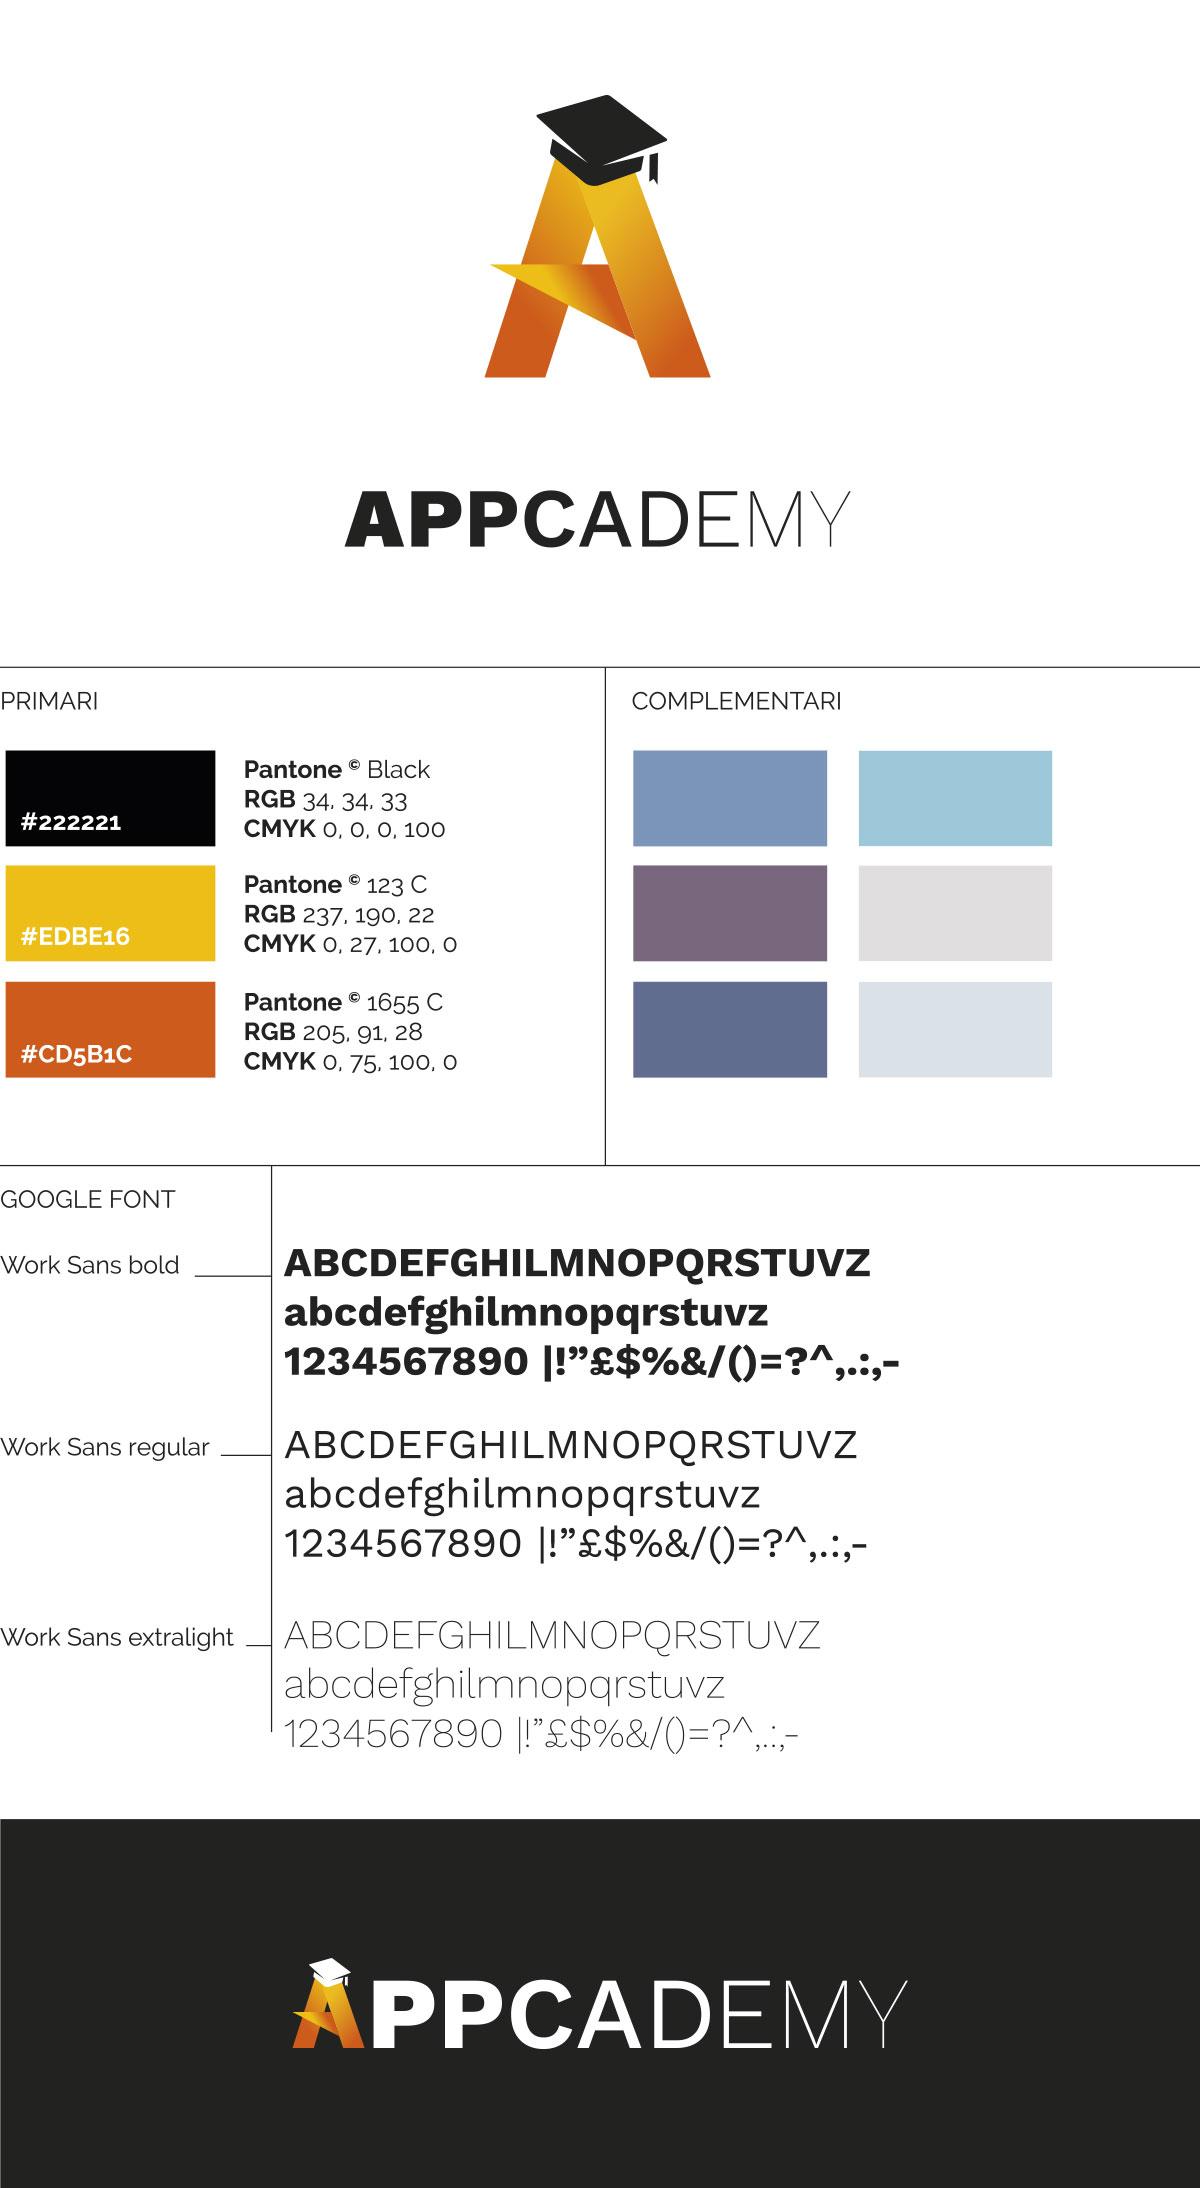 sviluppo-logotipo-appcademy